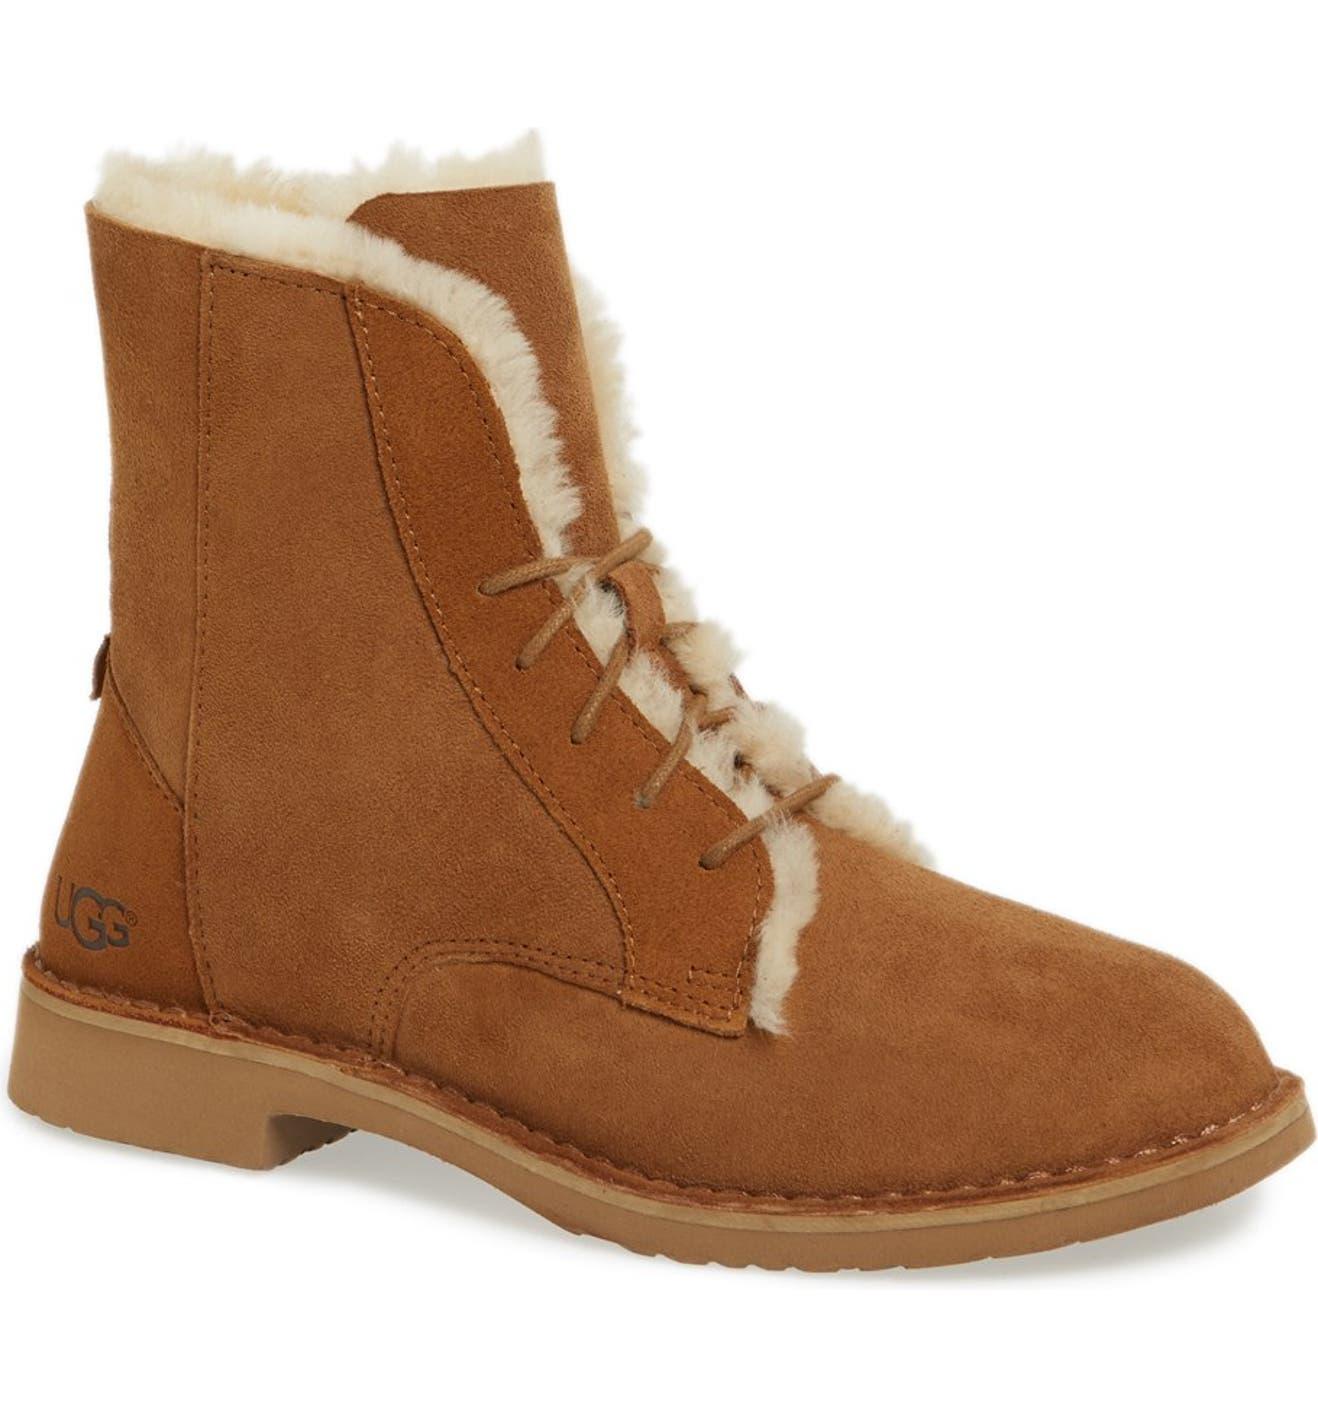 dc0b4604f06 Quincy Boot